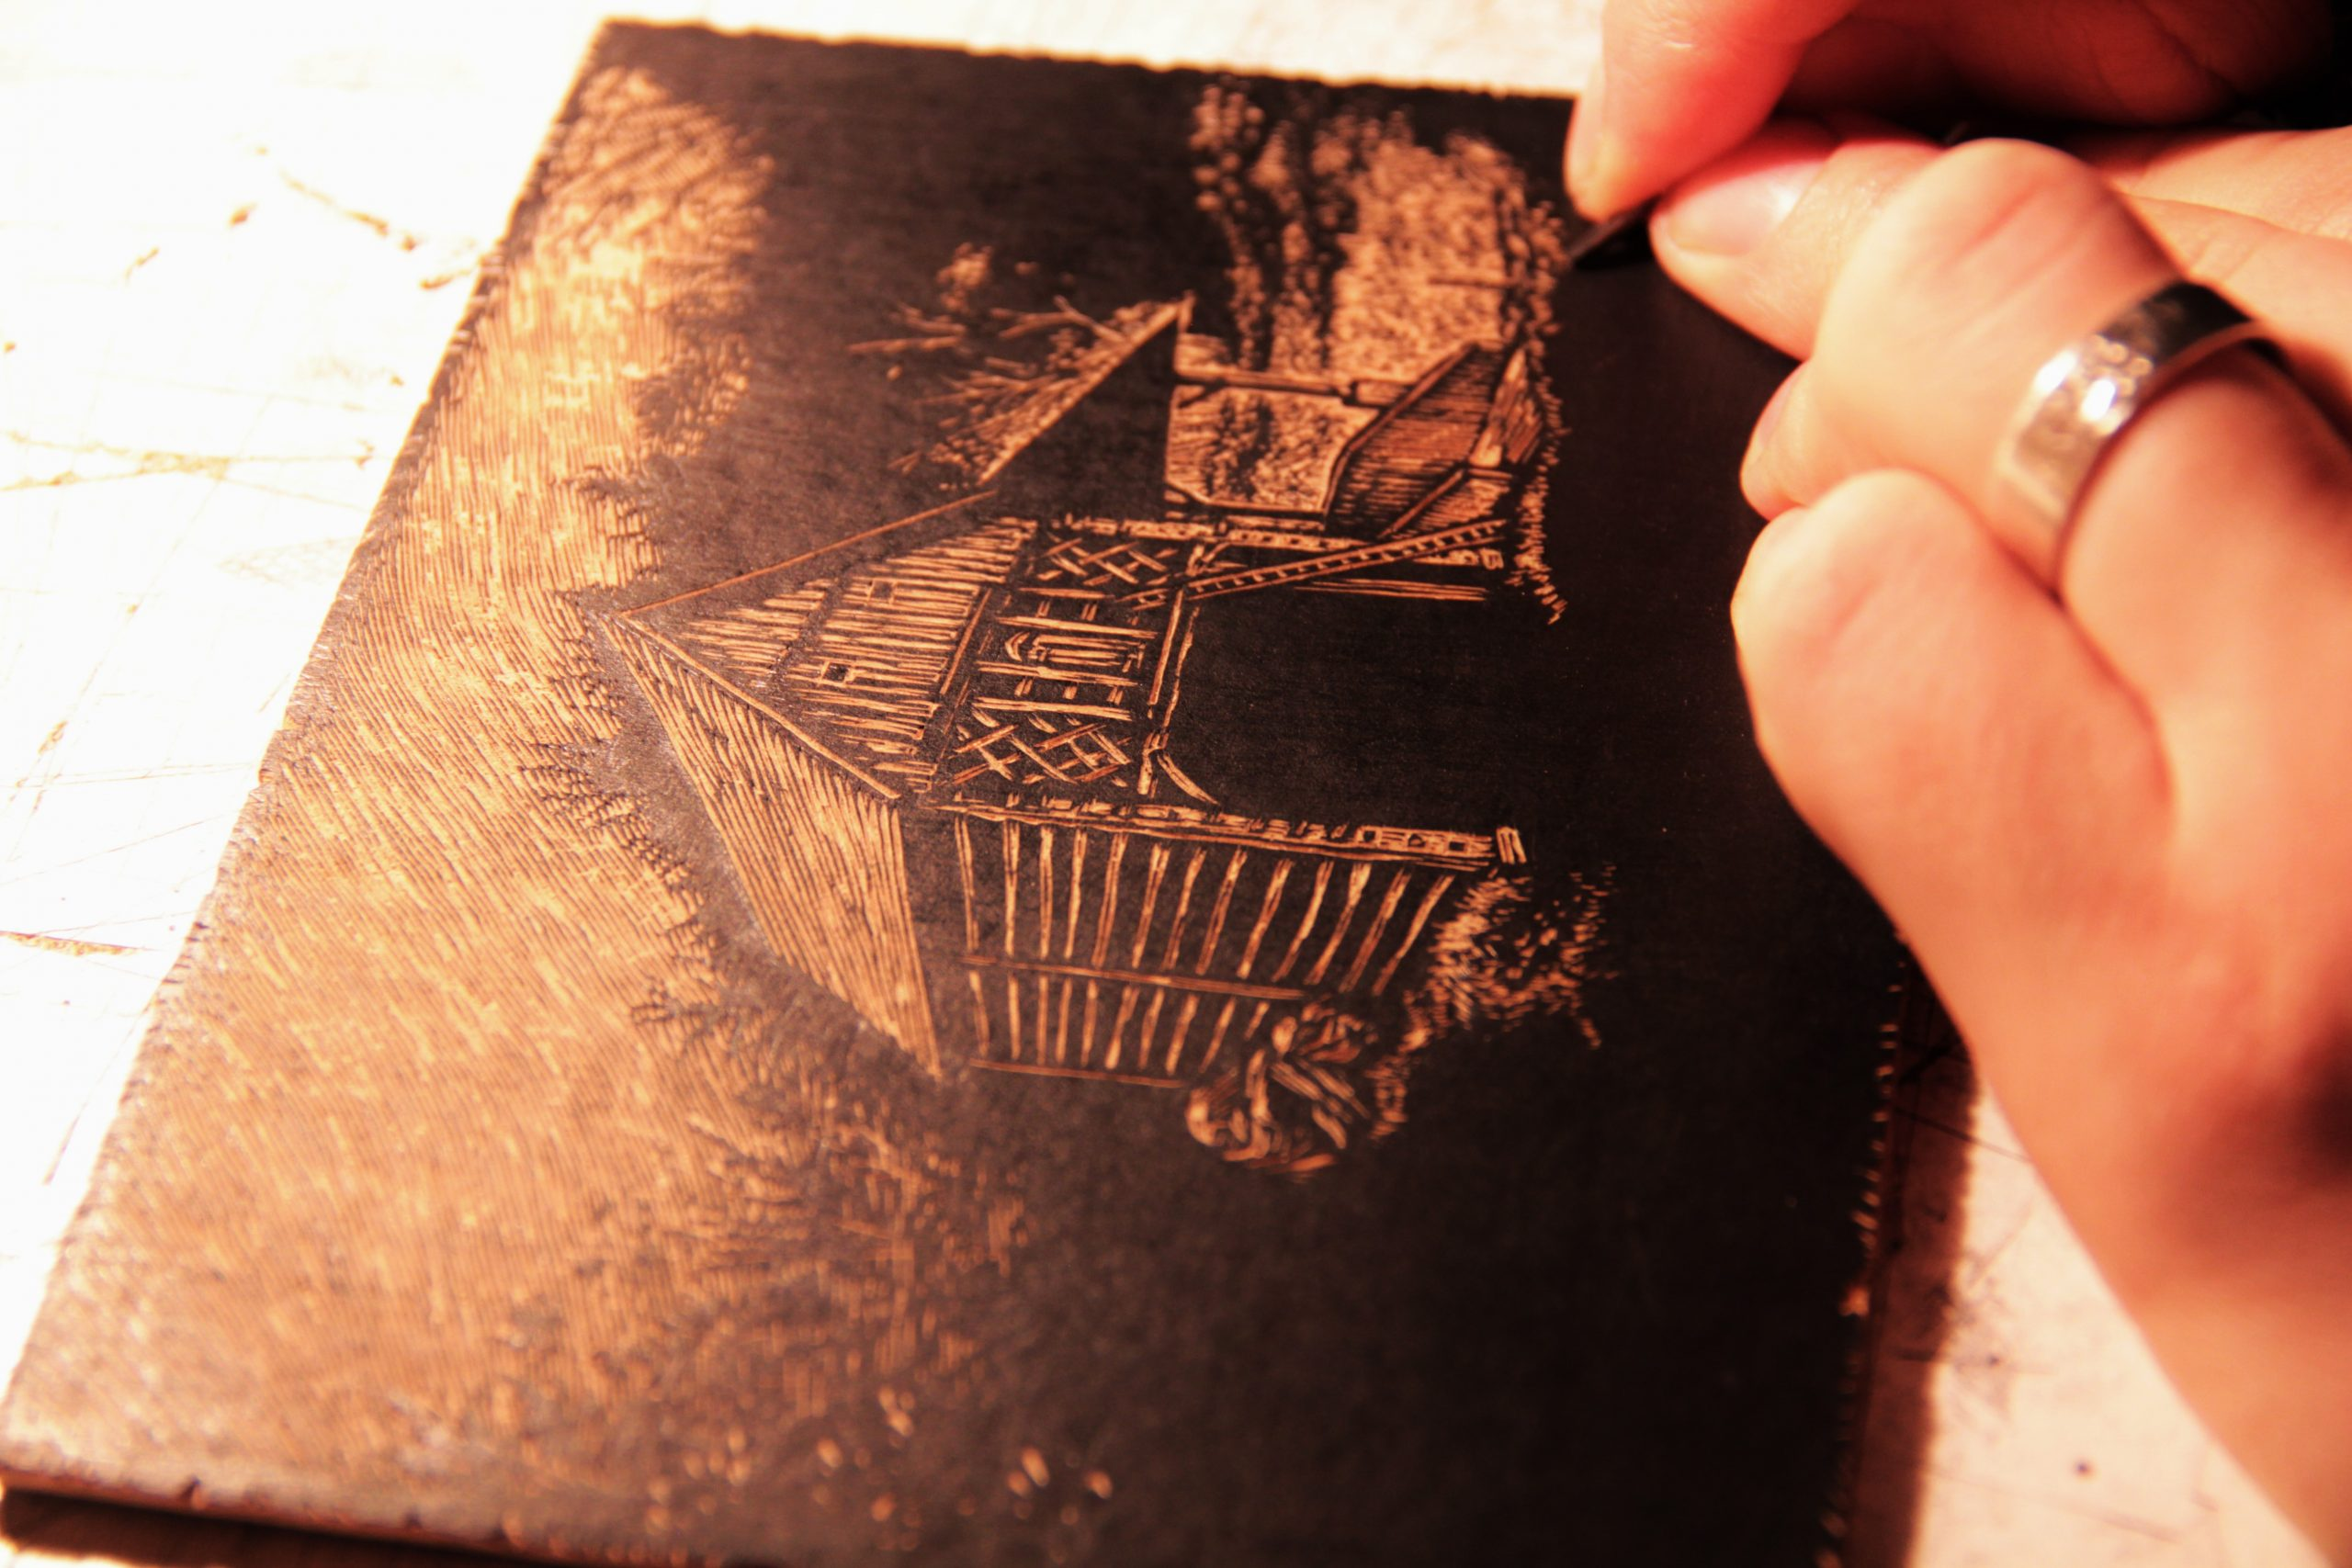 miha erič lesorez woodcut art reliefprint